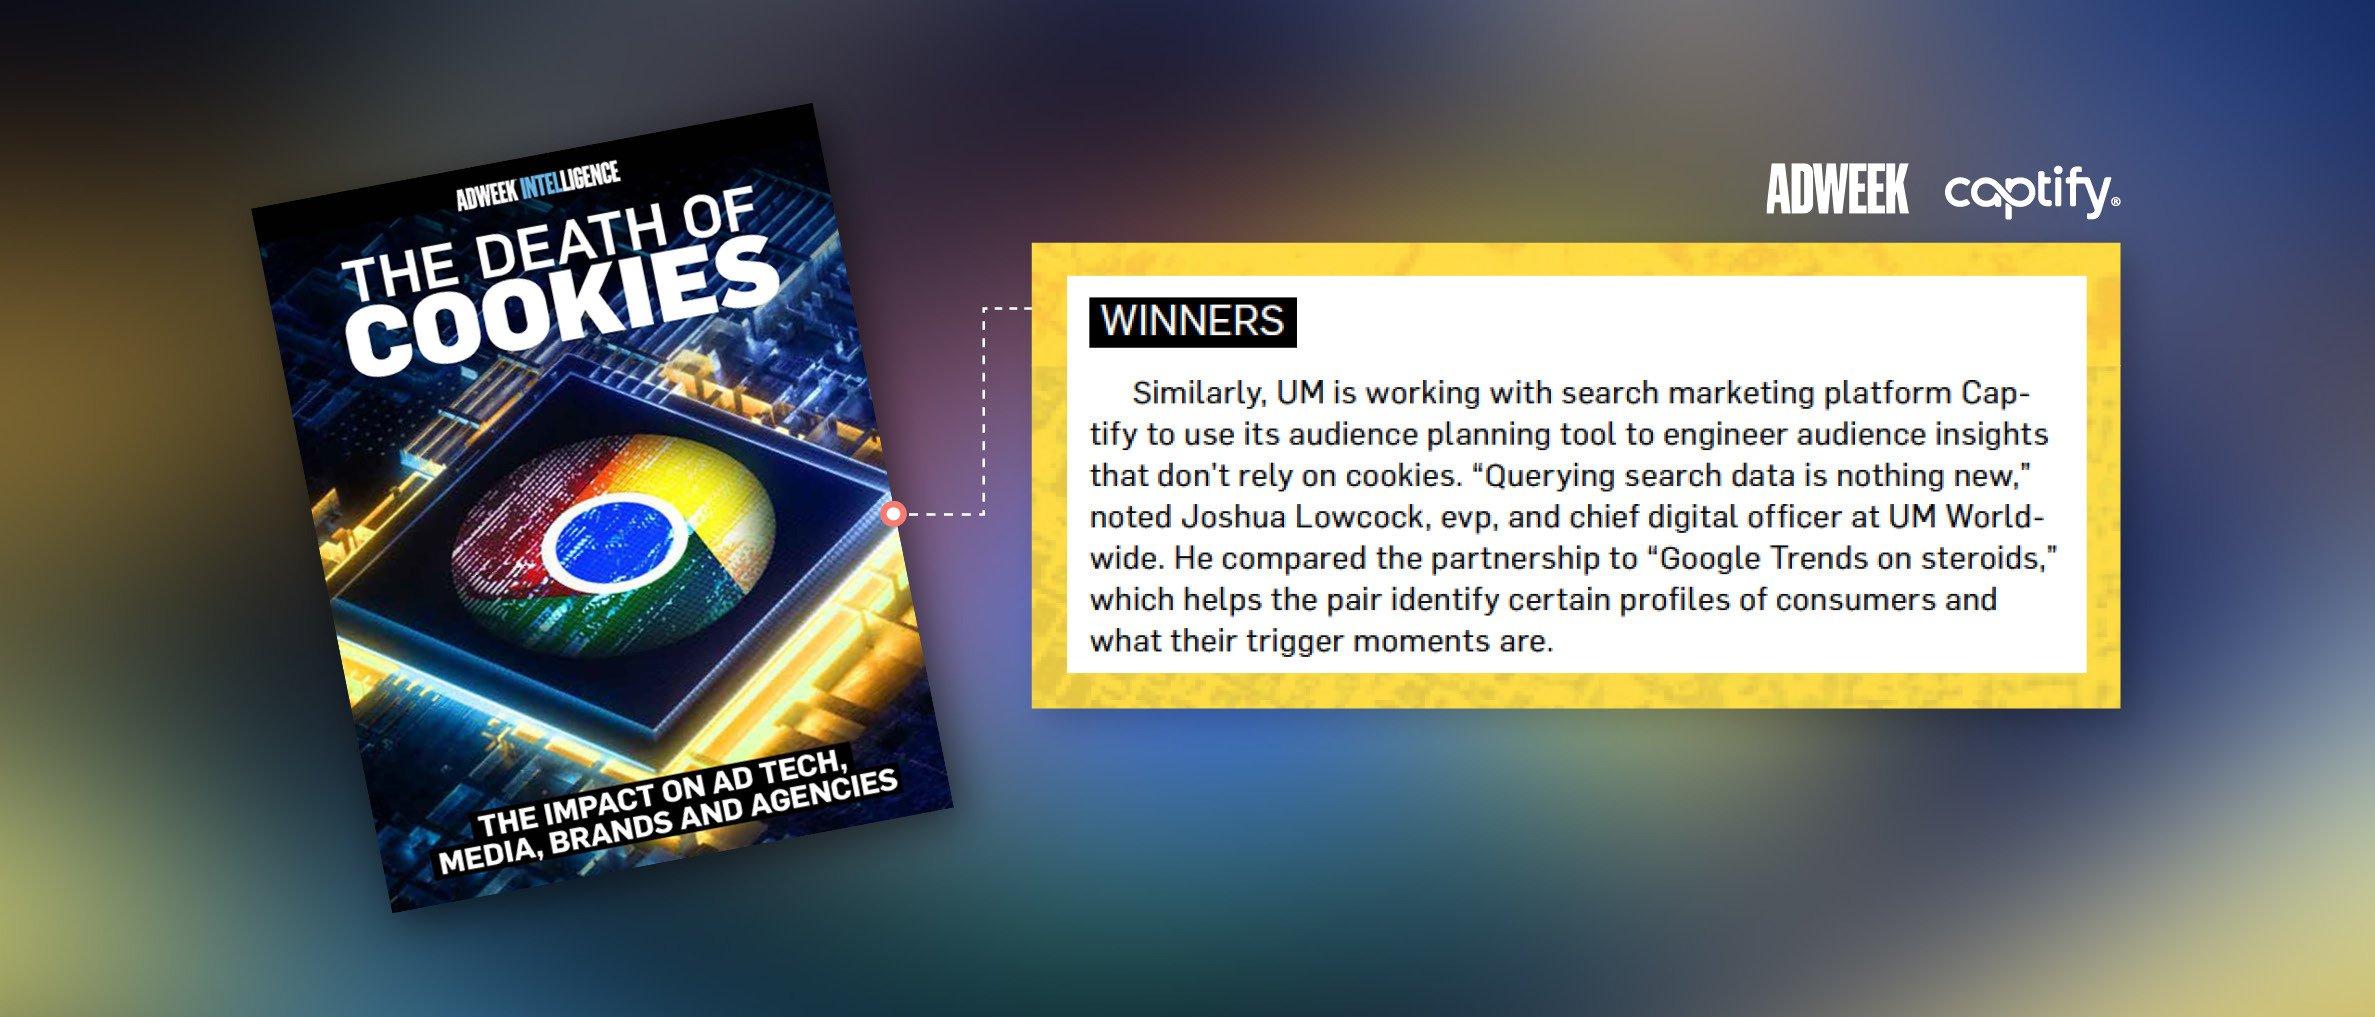 Captify's Self-Service Platform, Sense, is Crowned A Winner In Adweek's Special Report